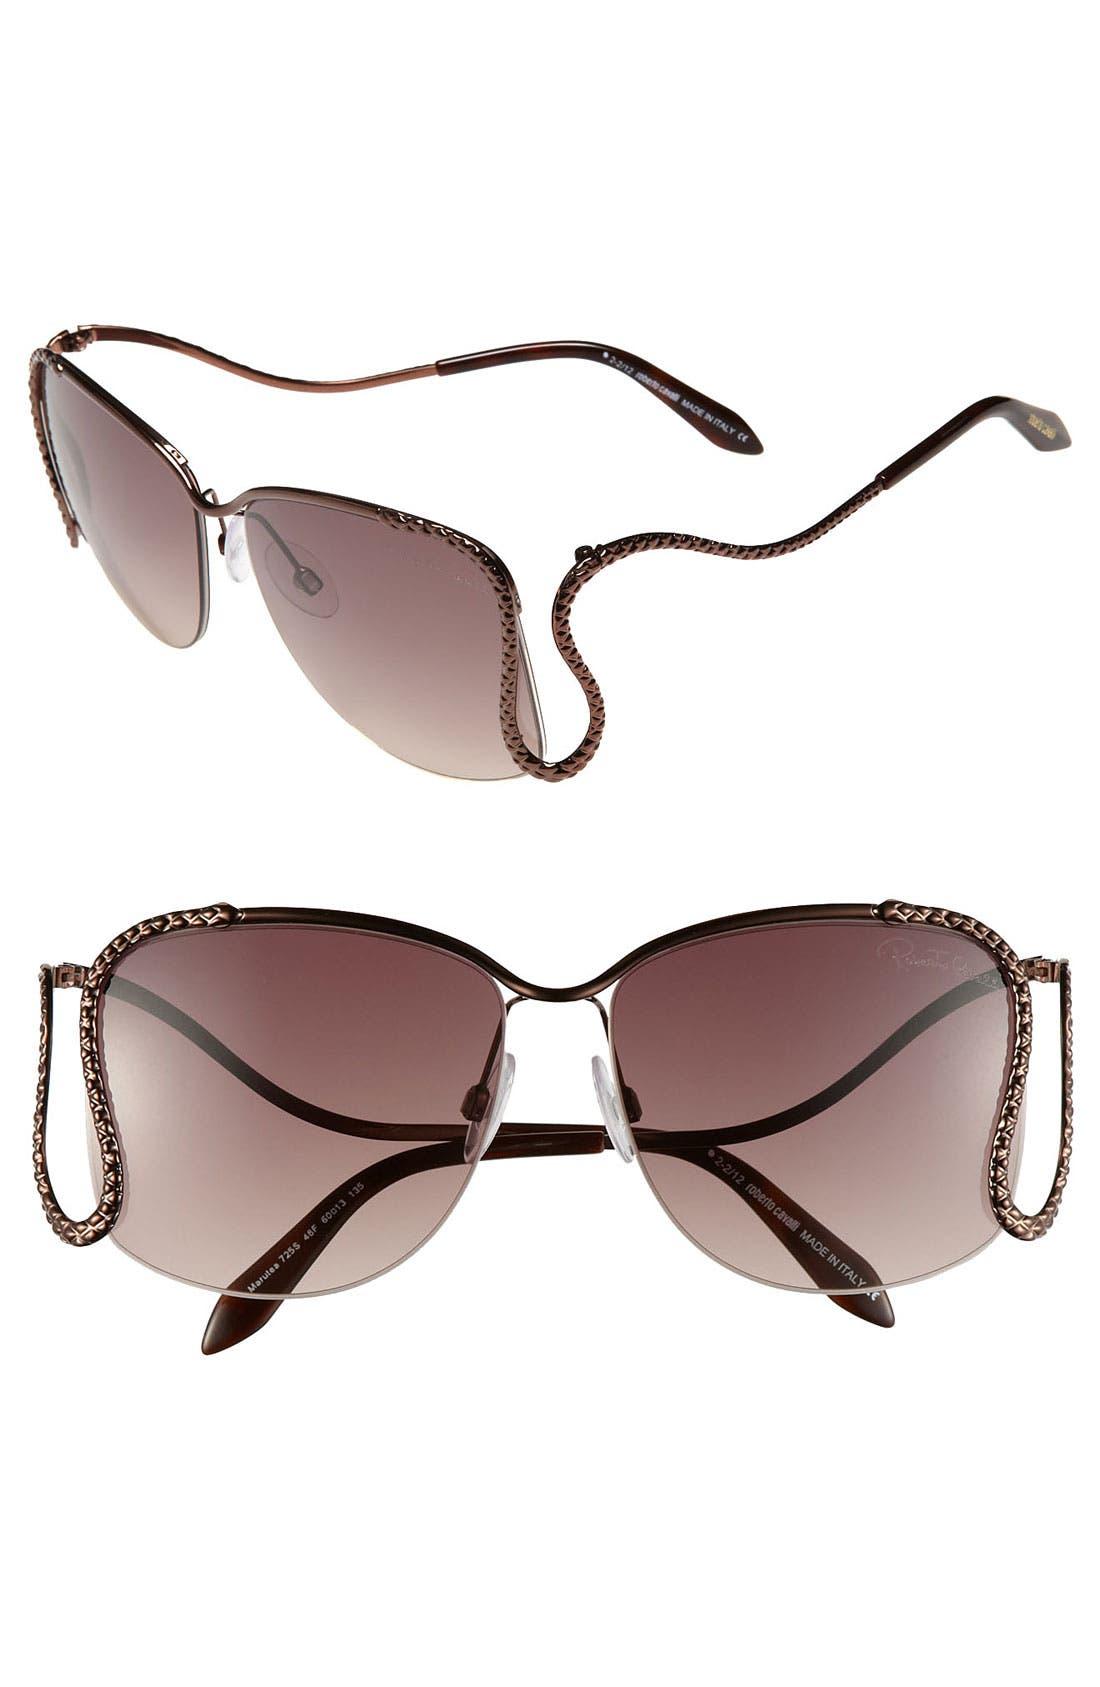 Main Image - Roberto Cavalli 'Serpent Drop' 60mm Sunglasses